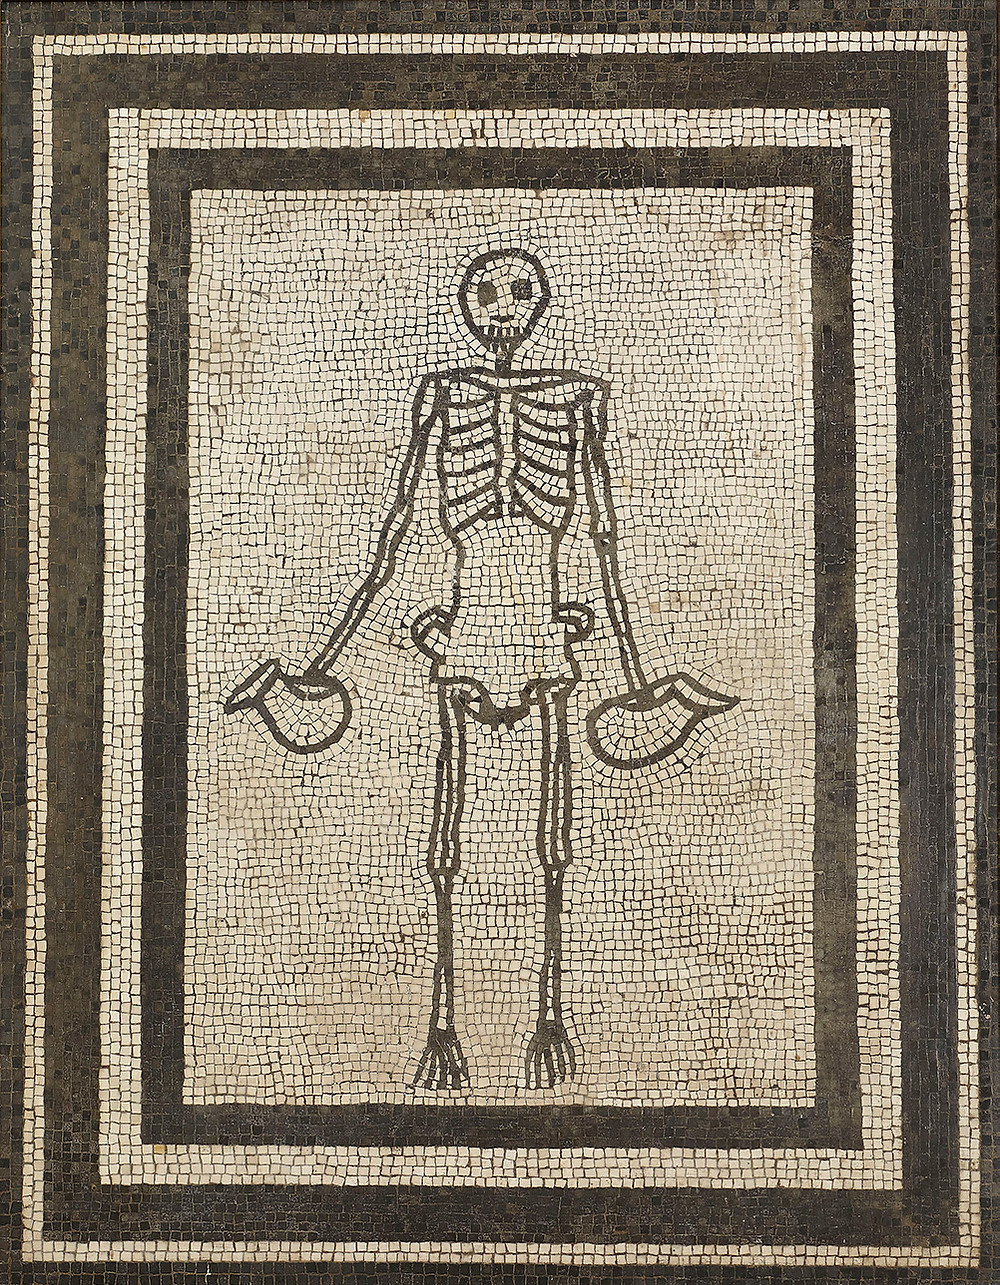 Roman mosaic showing skeleton holding two askoi or wine jugs